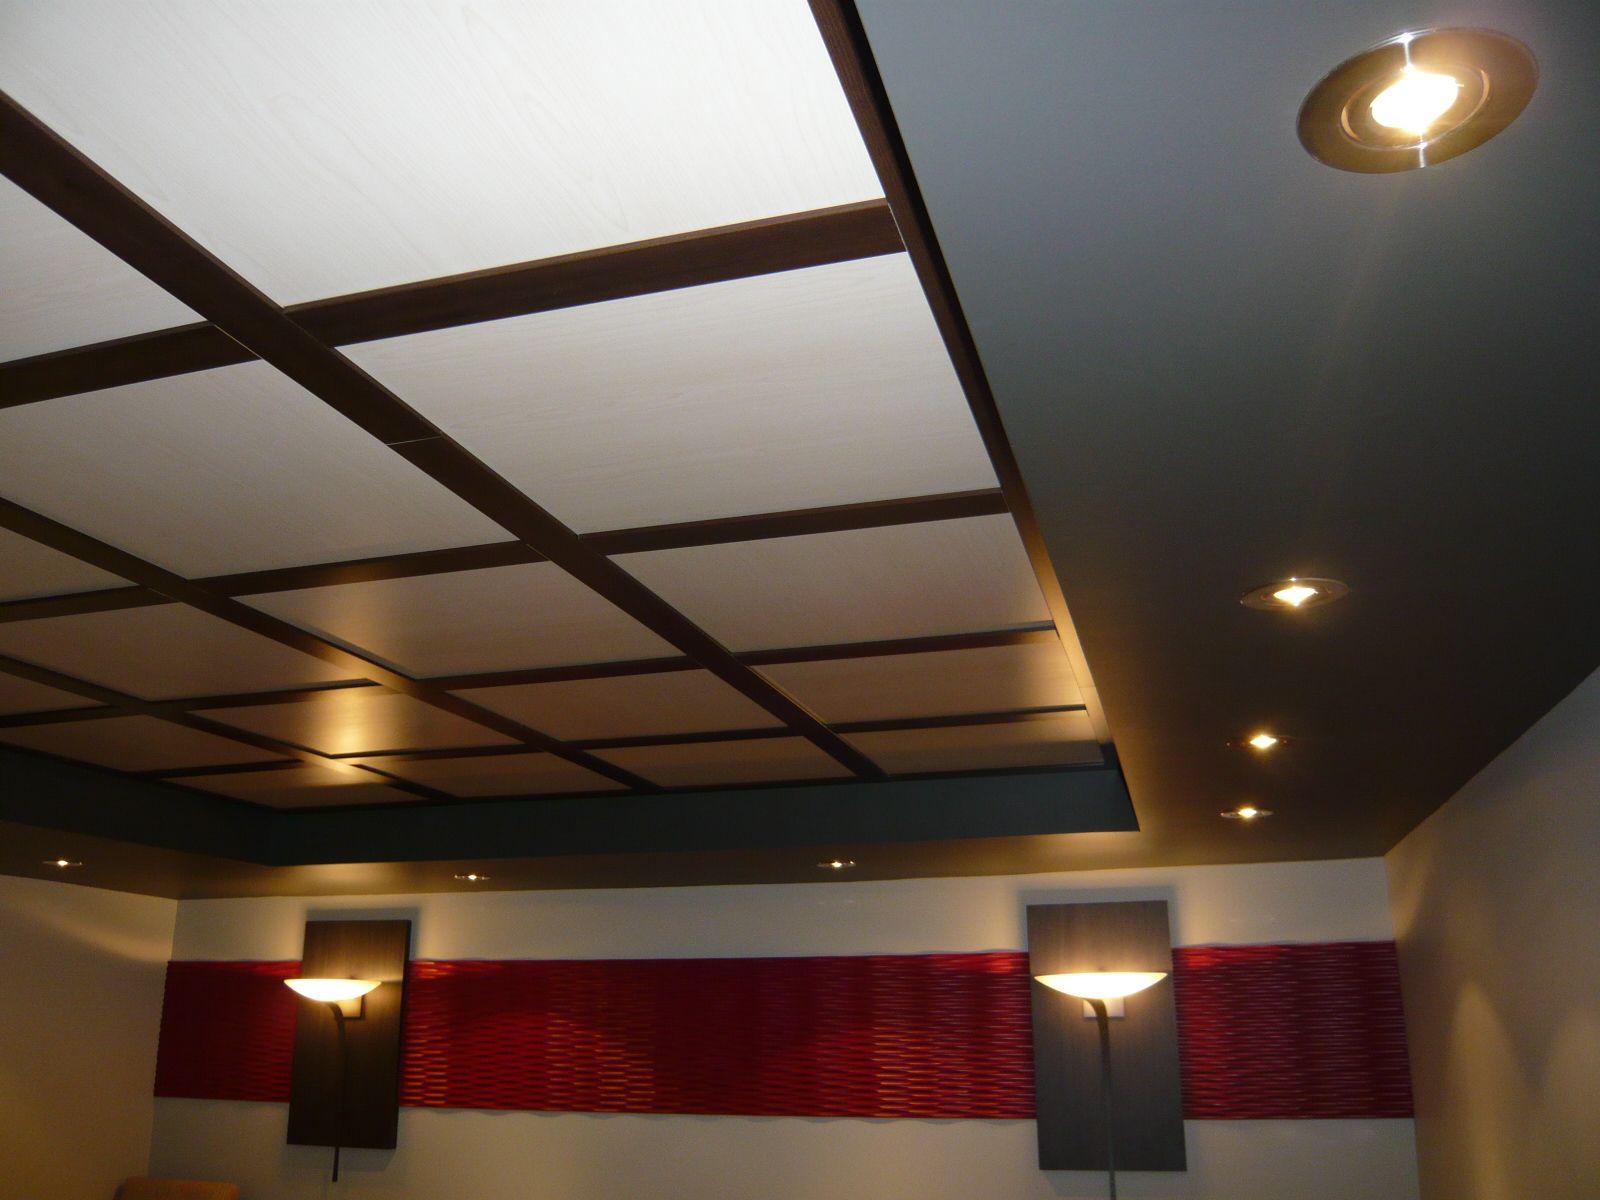 Plafond Suspendu Embassy 201 Rable Et Caf 233 Plafond